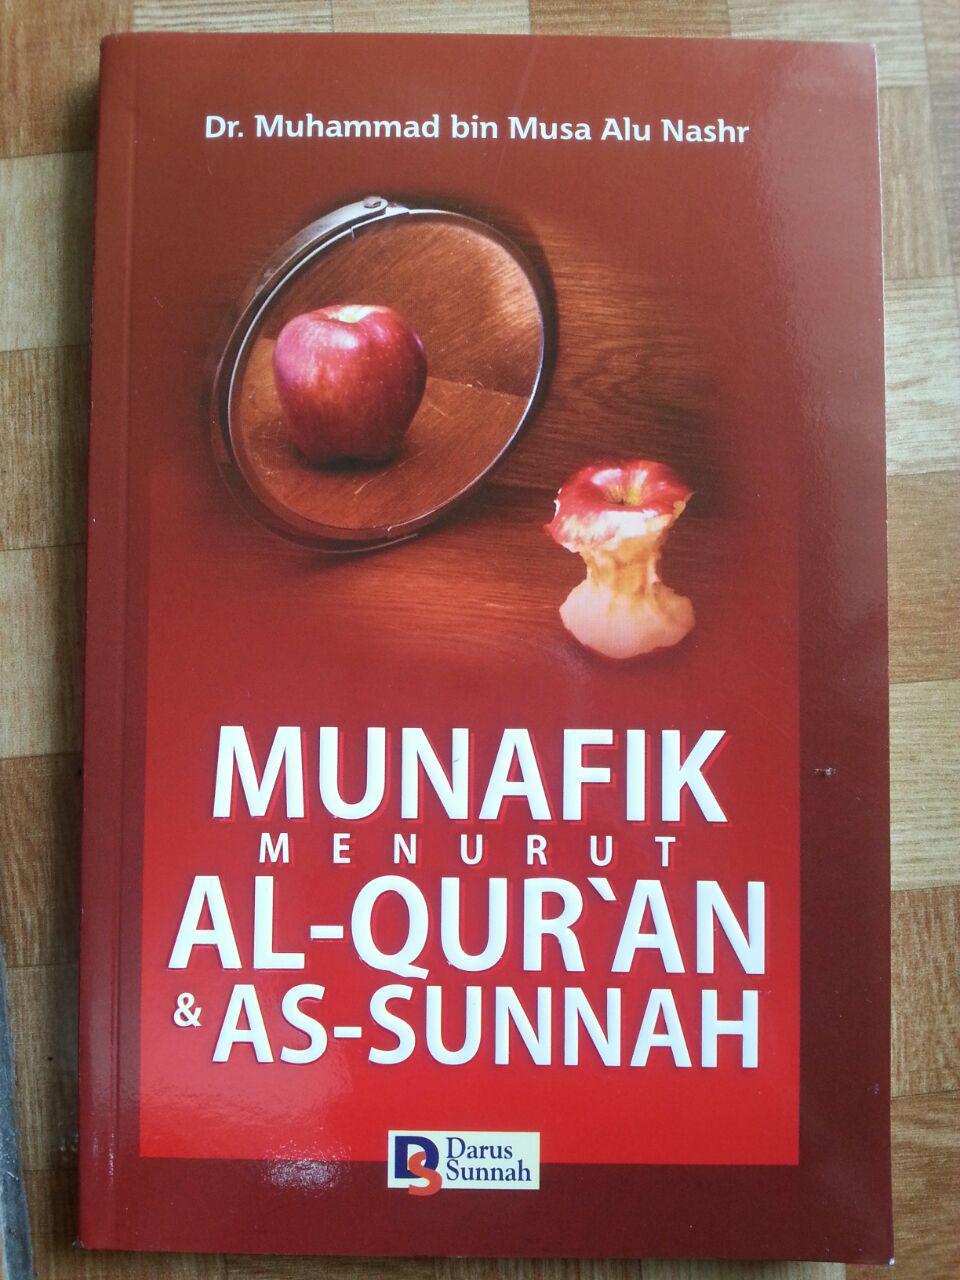 Buku Munafik Menurut Al-Quran dan As-Sunnah cover